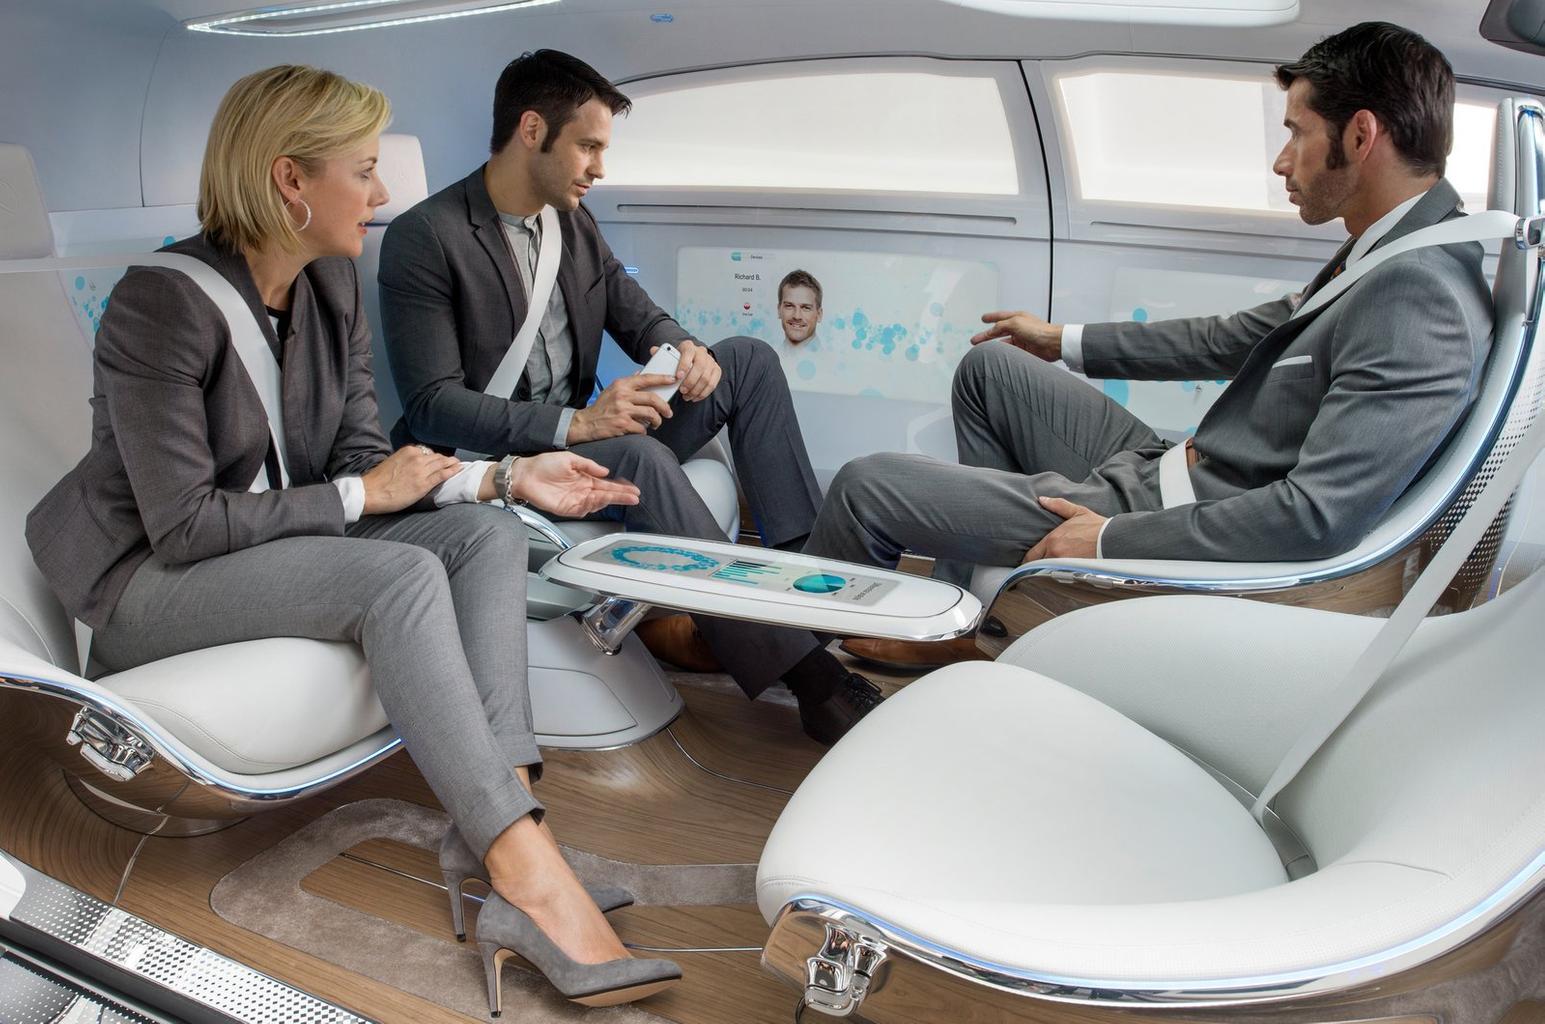 Semi-autonomous cars present safety risks, drivers warned